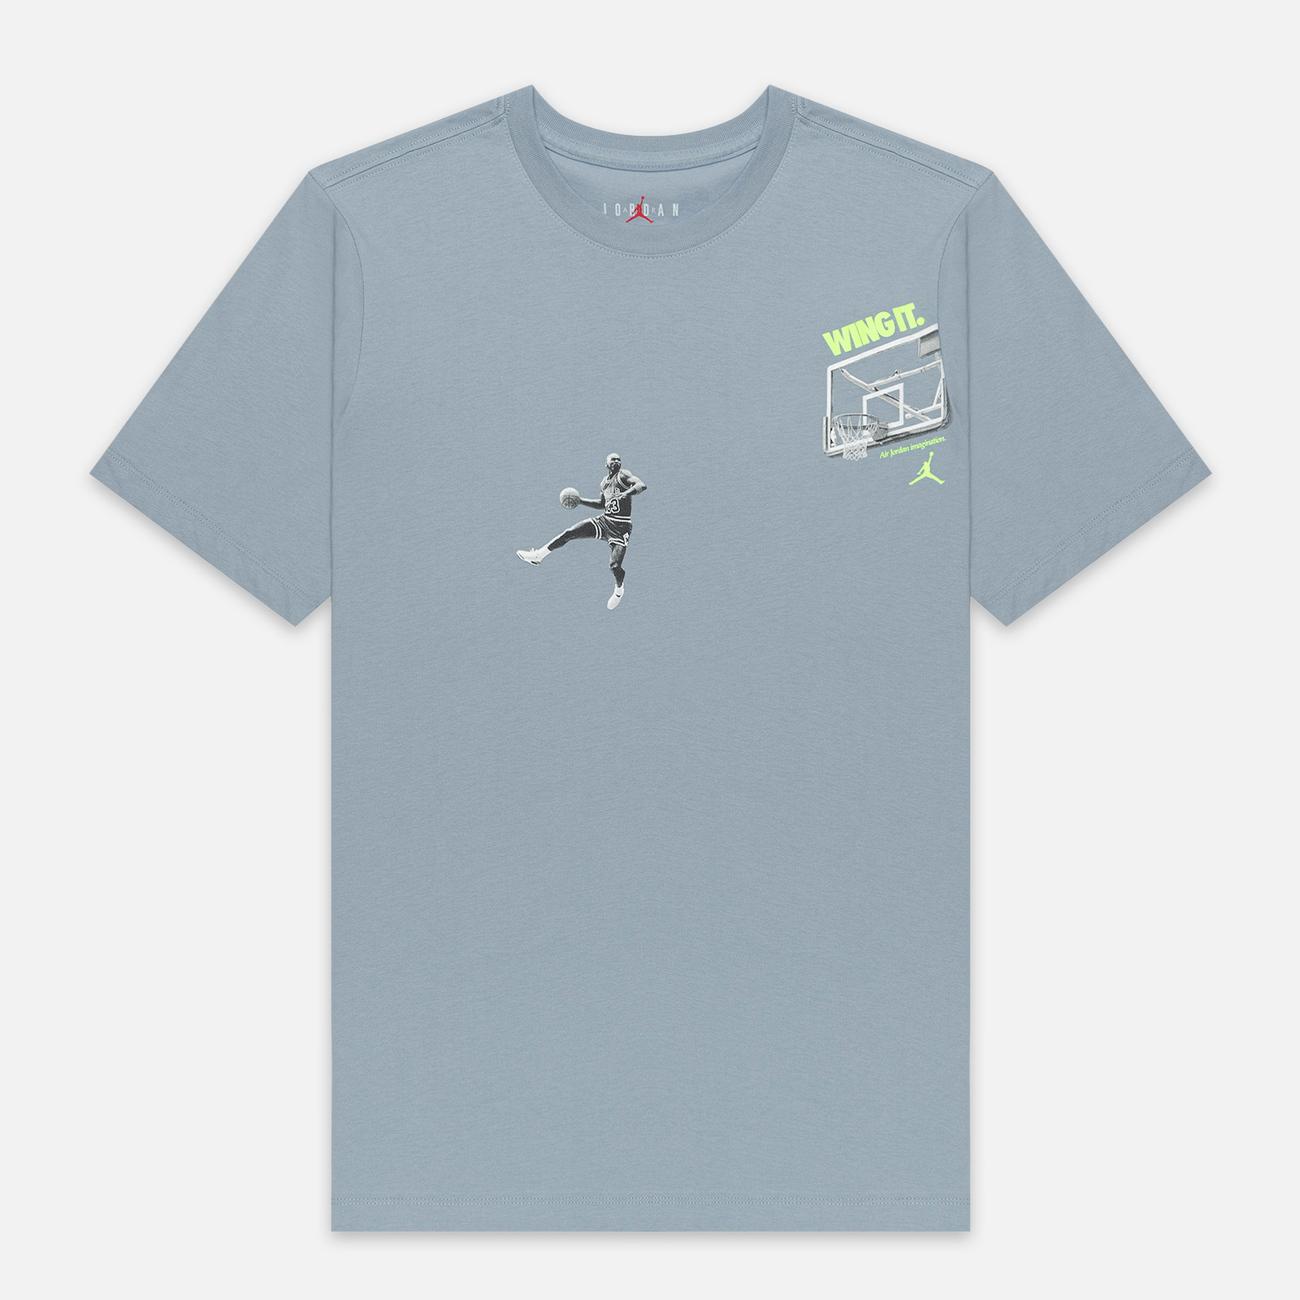 Мужская футболка Jordan Photo Wing It Obsidian Mist